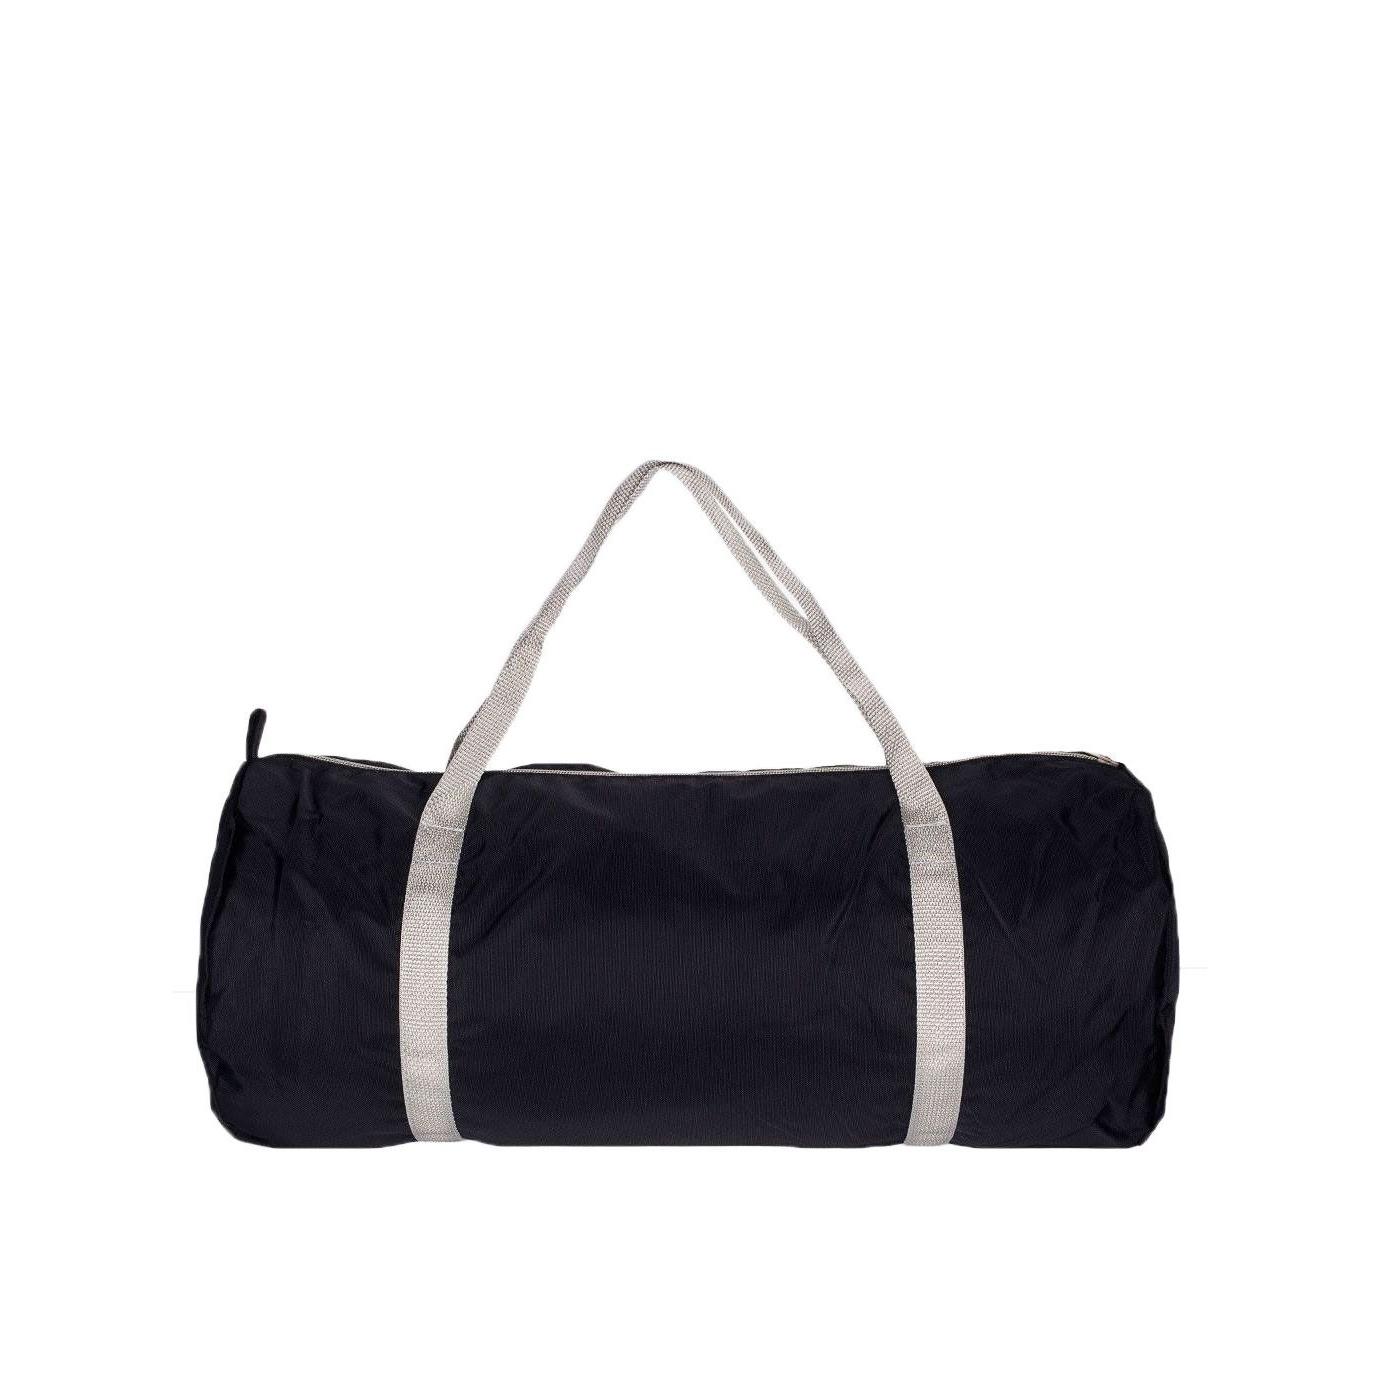 american apparel nylon sport gym tasche ebay. Black Bedroom Furniture Sets. Home Design Ideas